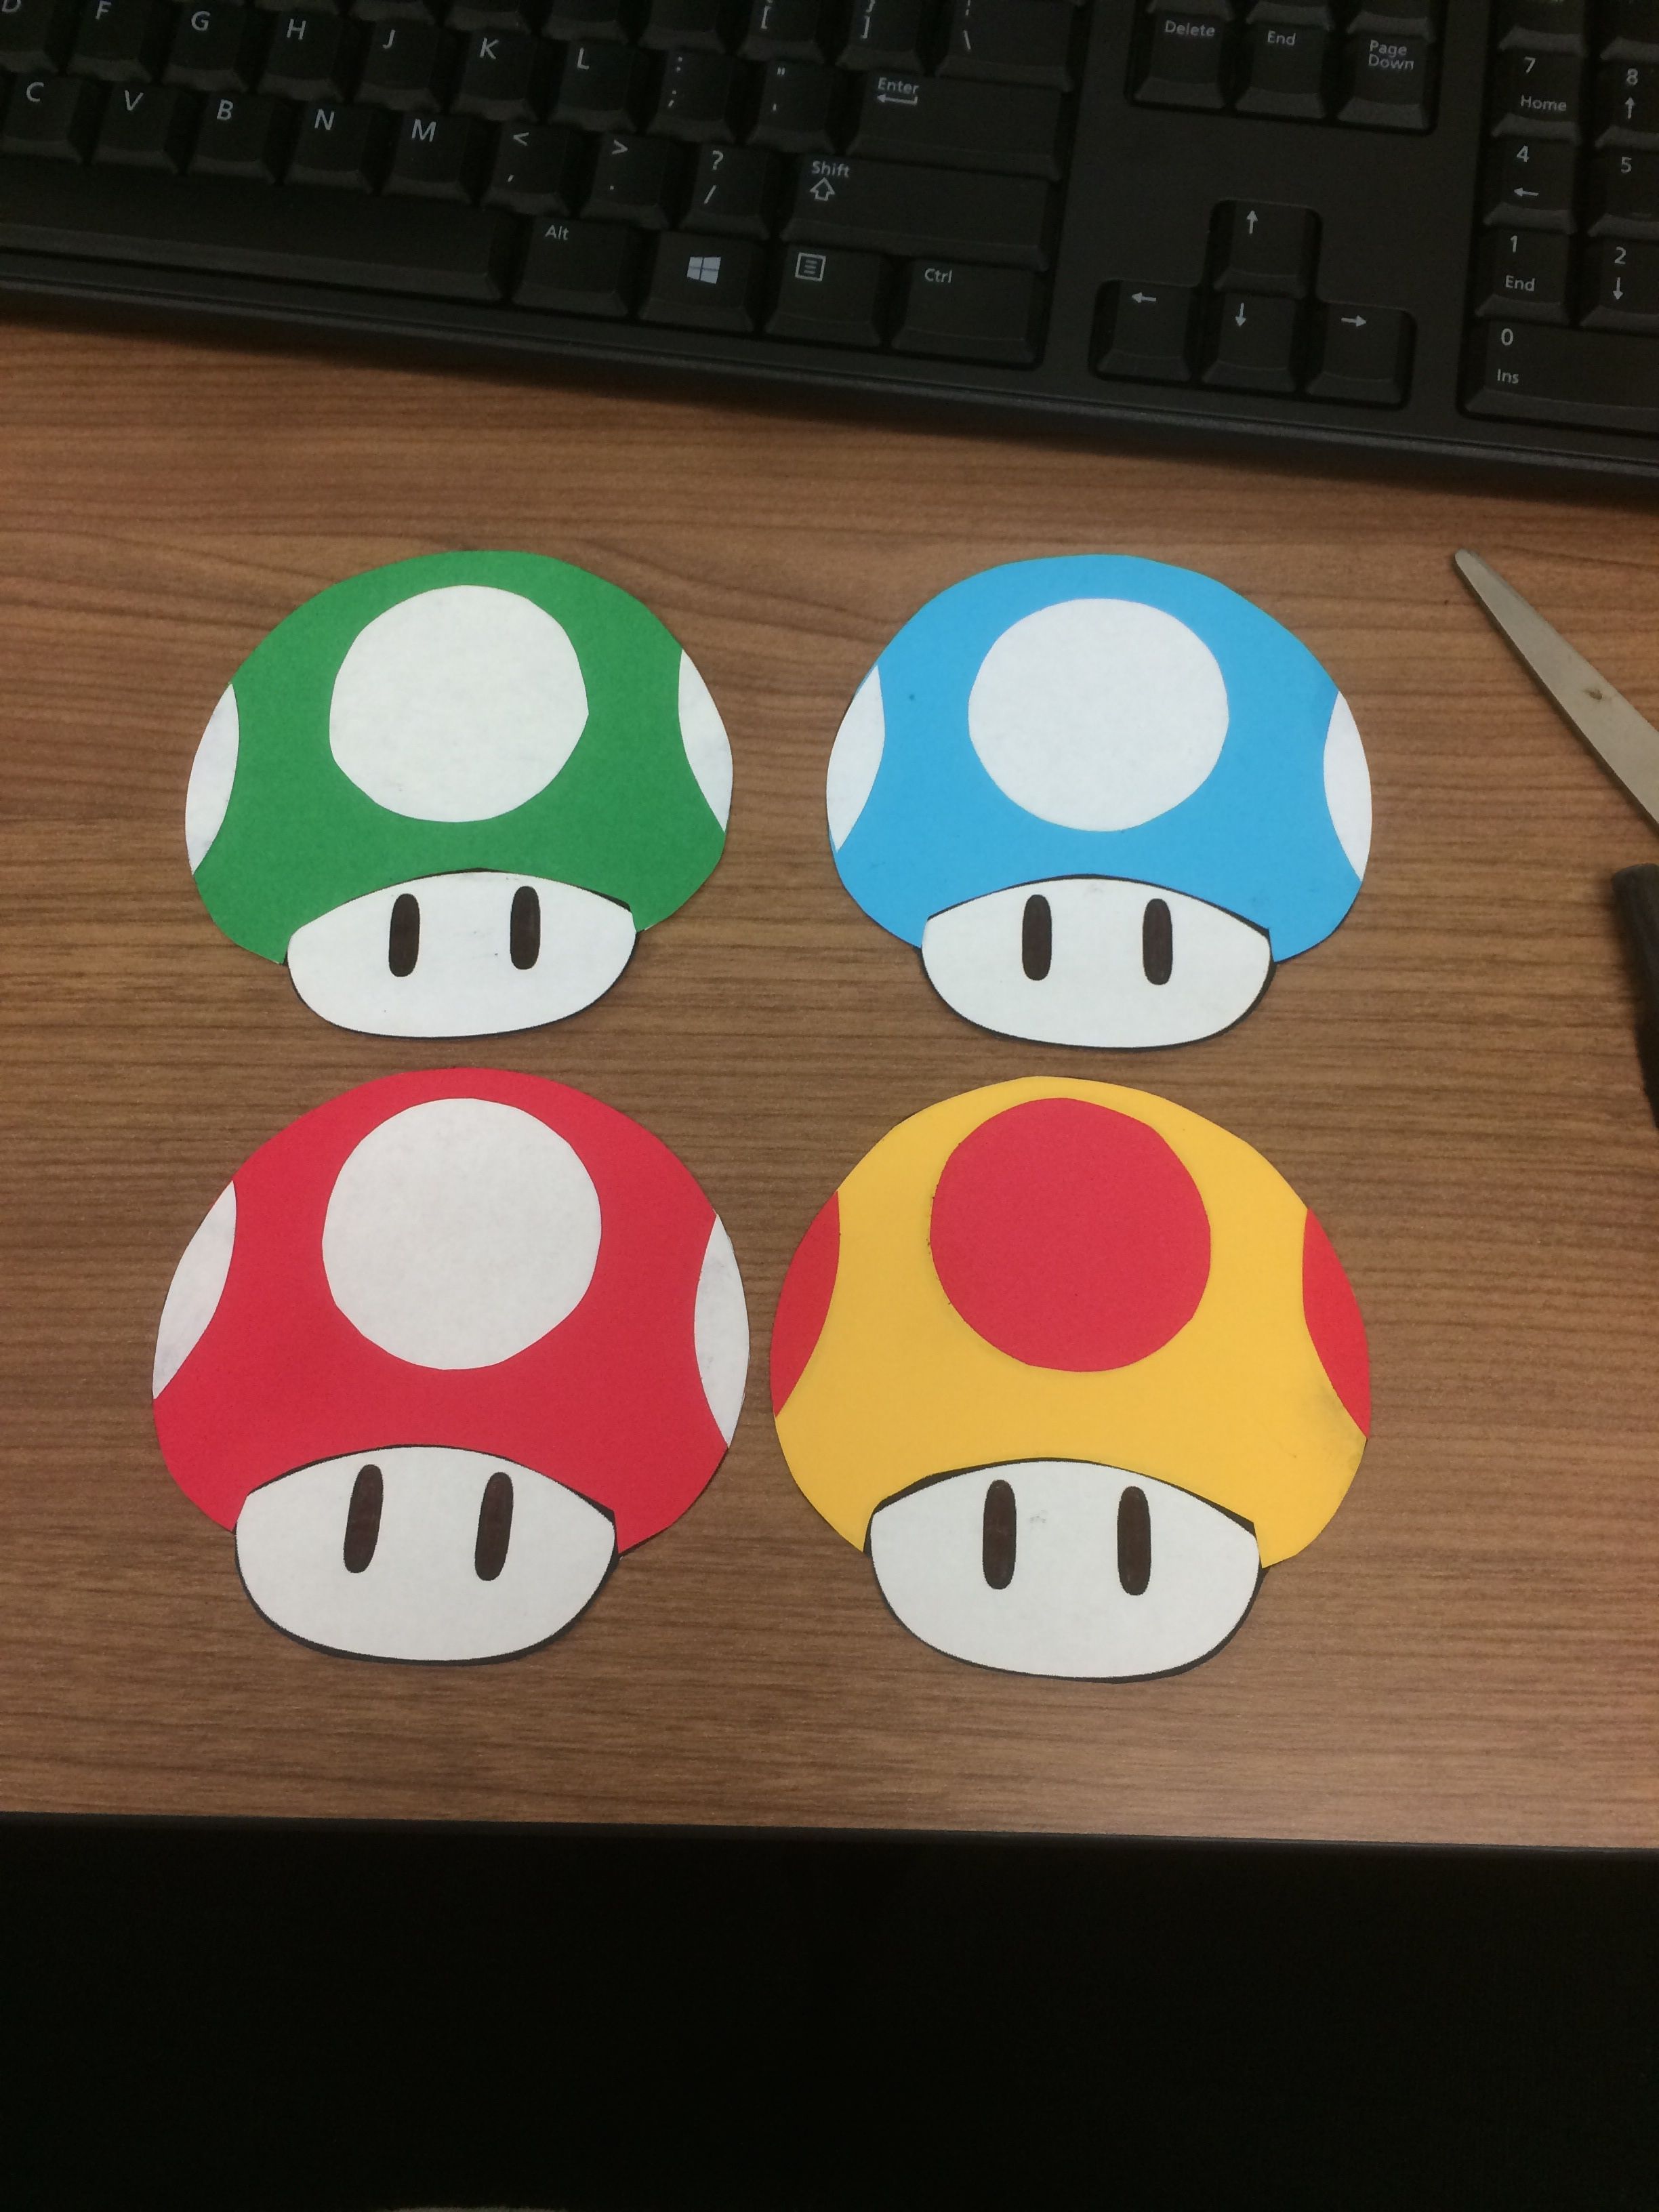 September Door Decs To Go With Mario Board I Printed The Mushrooms Out On White Paper And Then Traced And Gl Door Decs Door Decs College Dorm Door Decorations